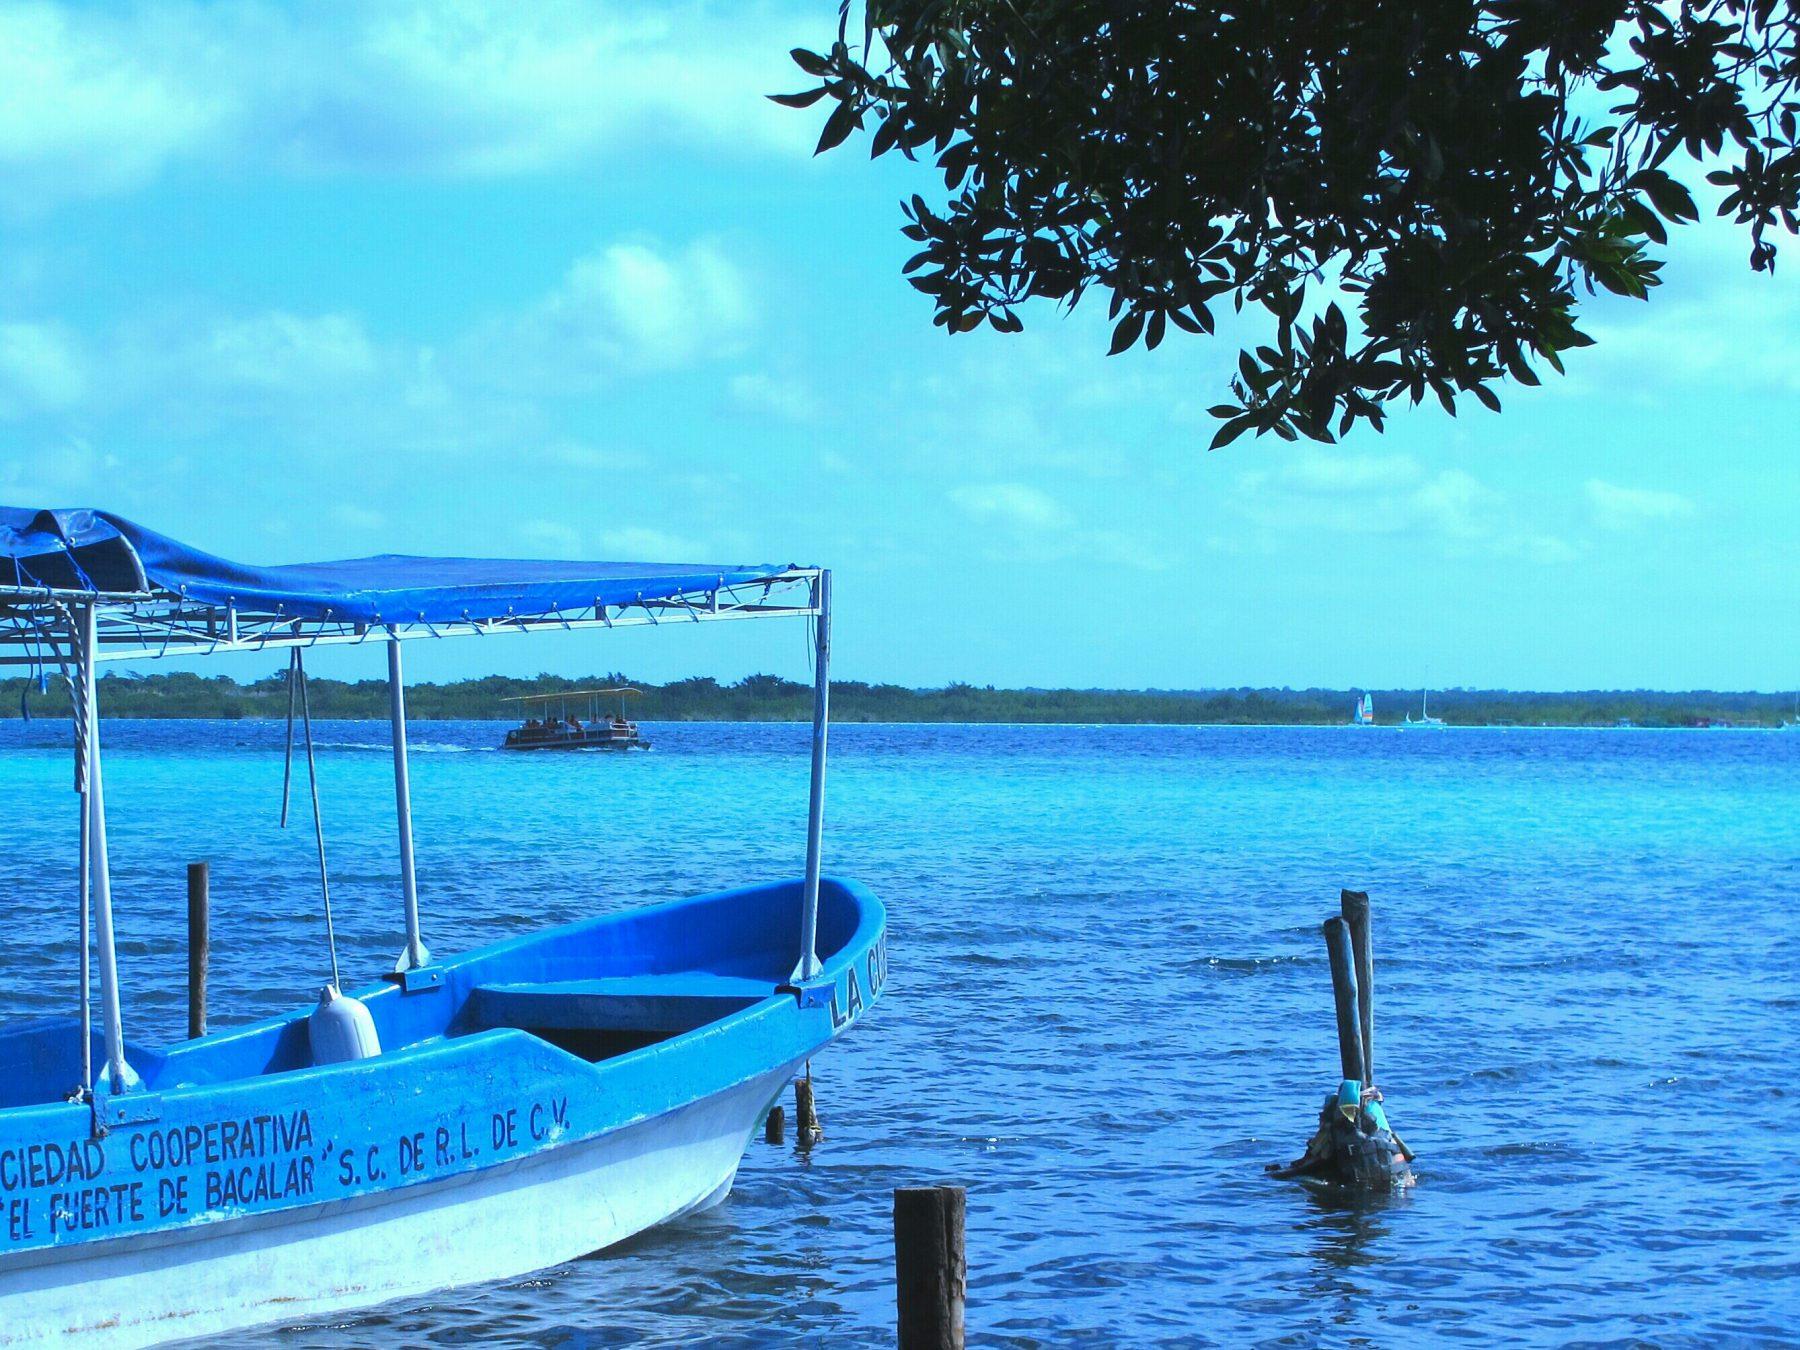 Laguna de Bacalar, Quintana Roo